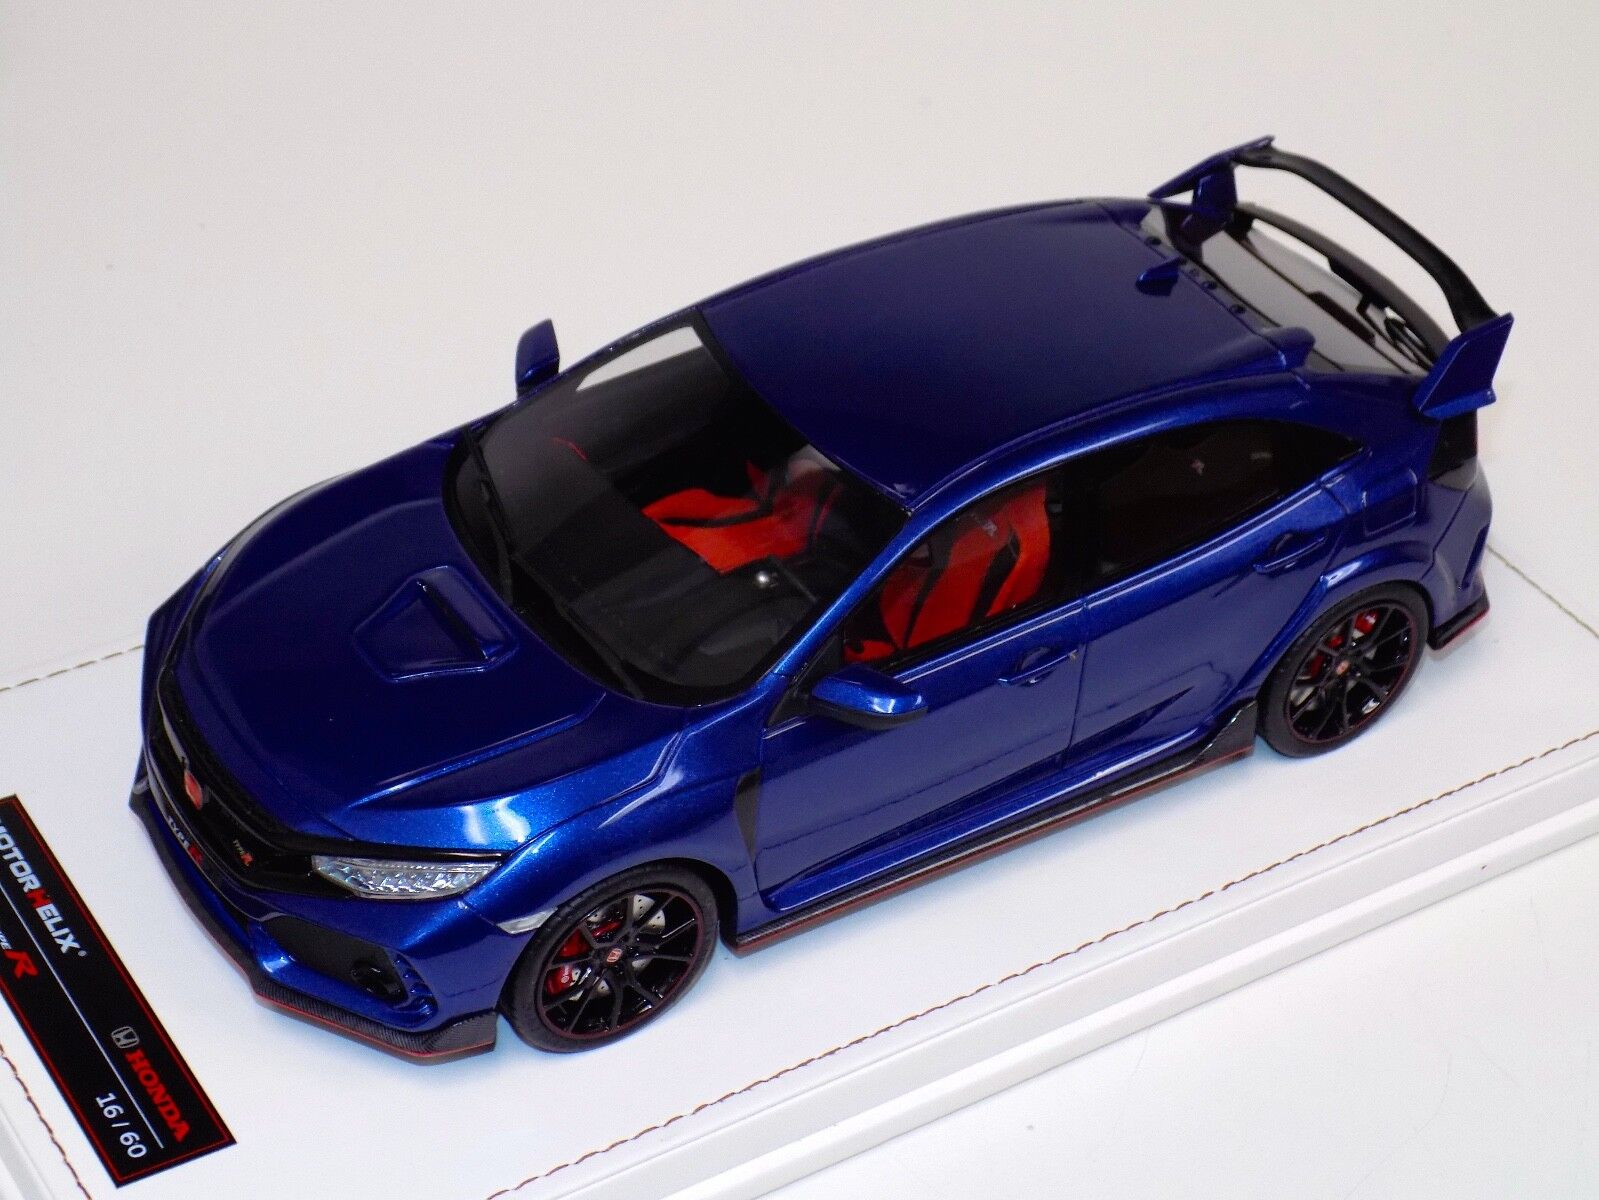 1/18 MotorHelix Honda Civic Type R LHD in Gloss Metallic Blue Leather base